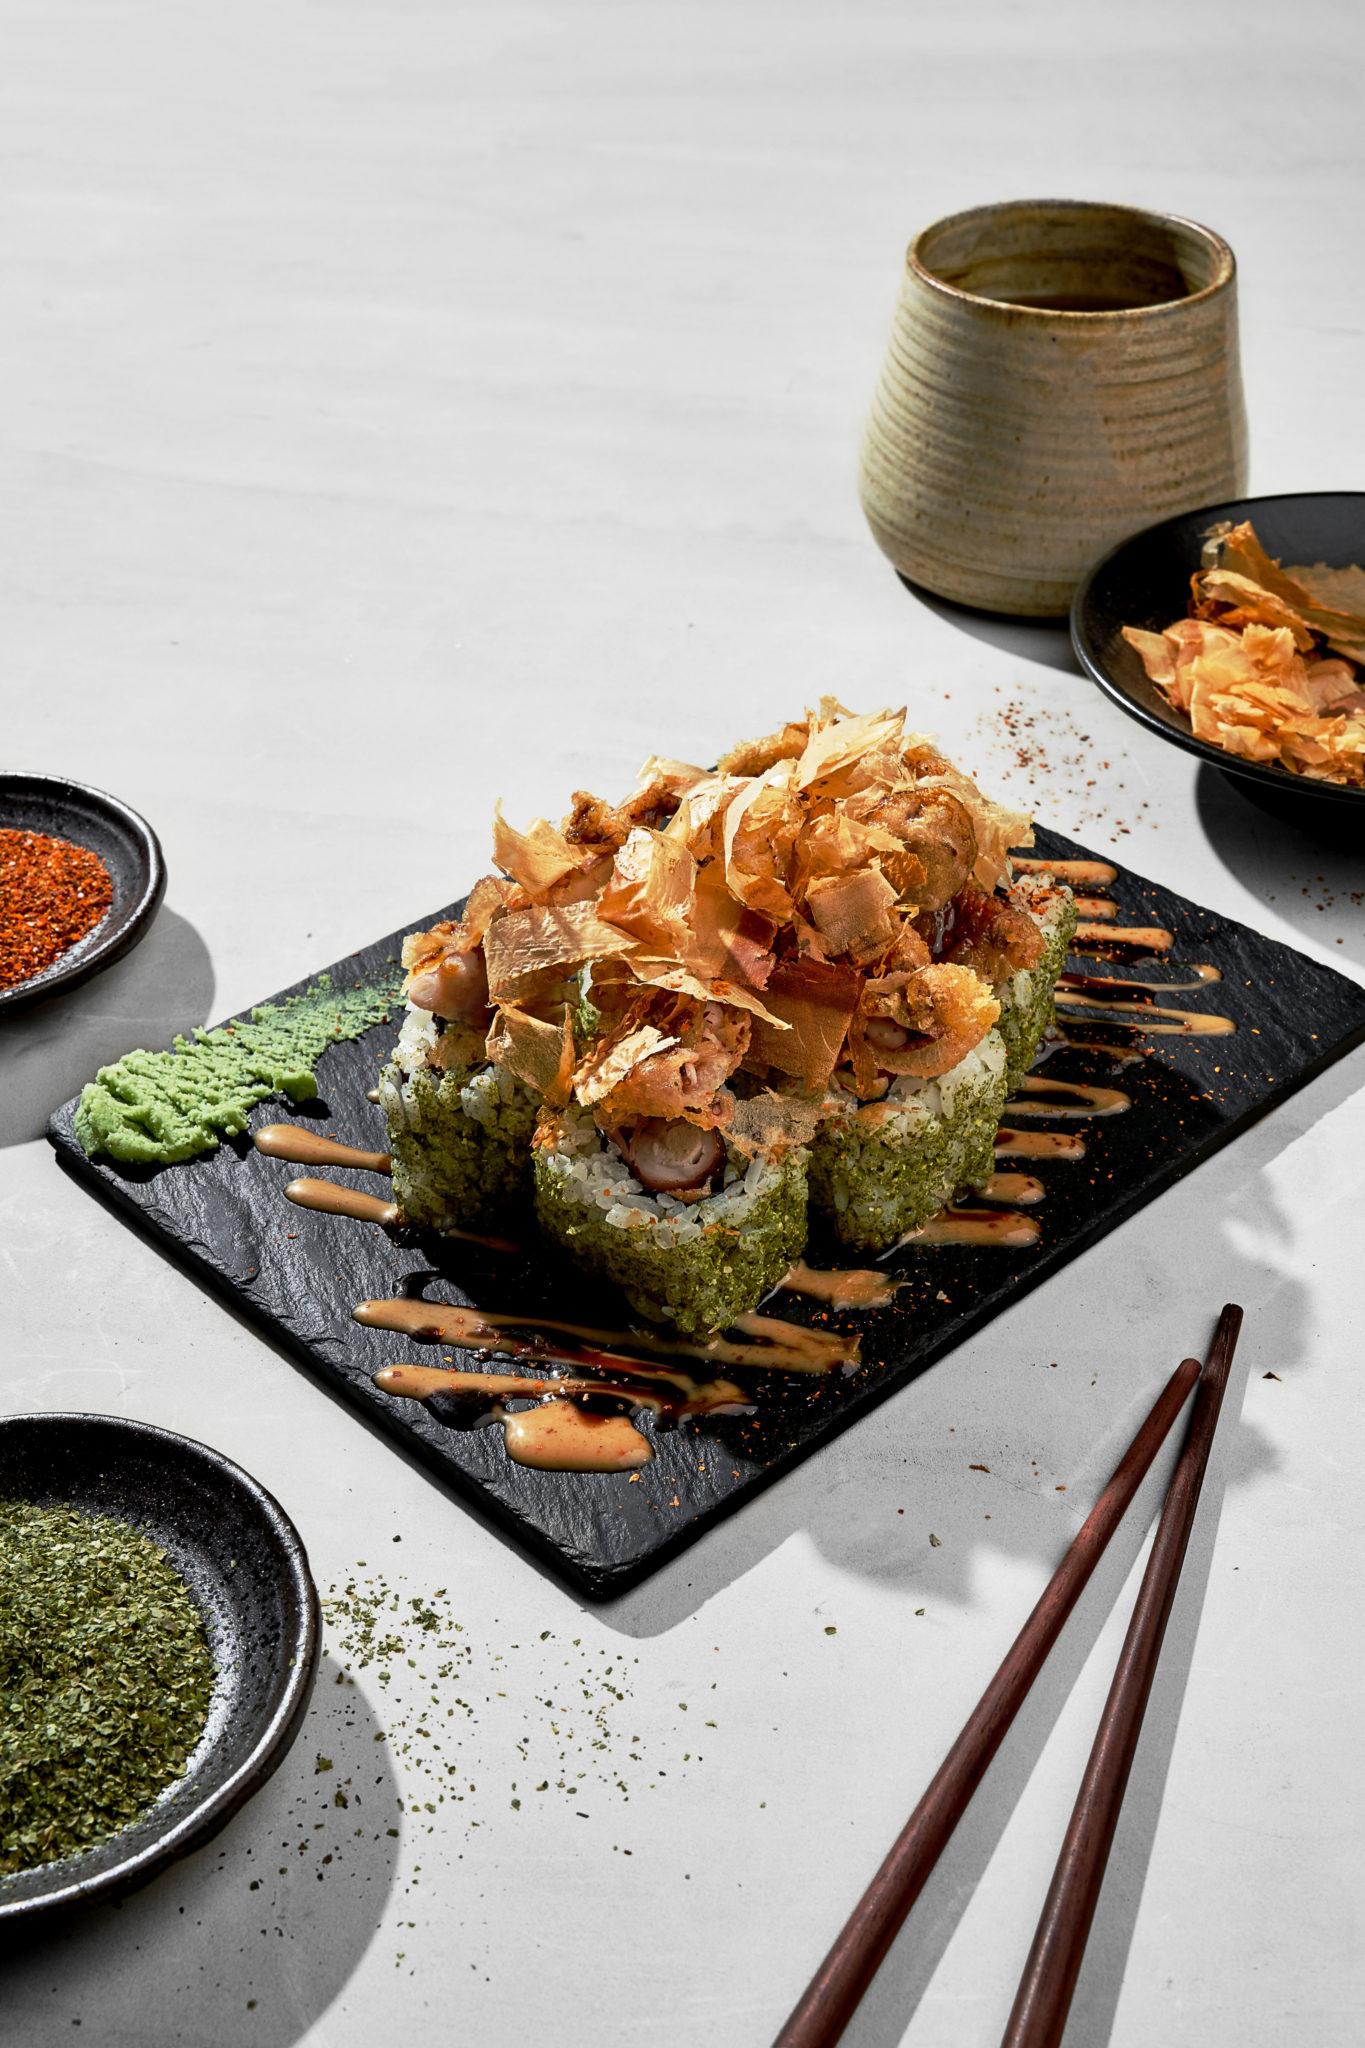 Ooma menu update: Crispy taco maki